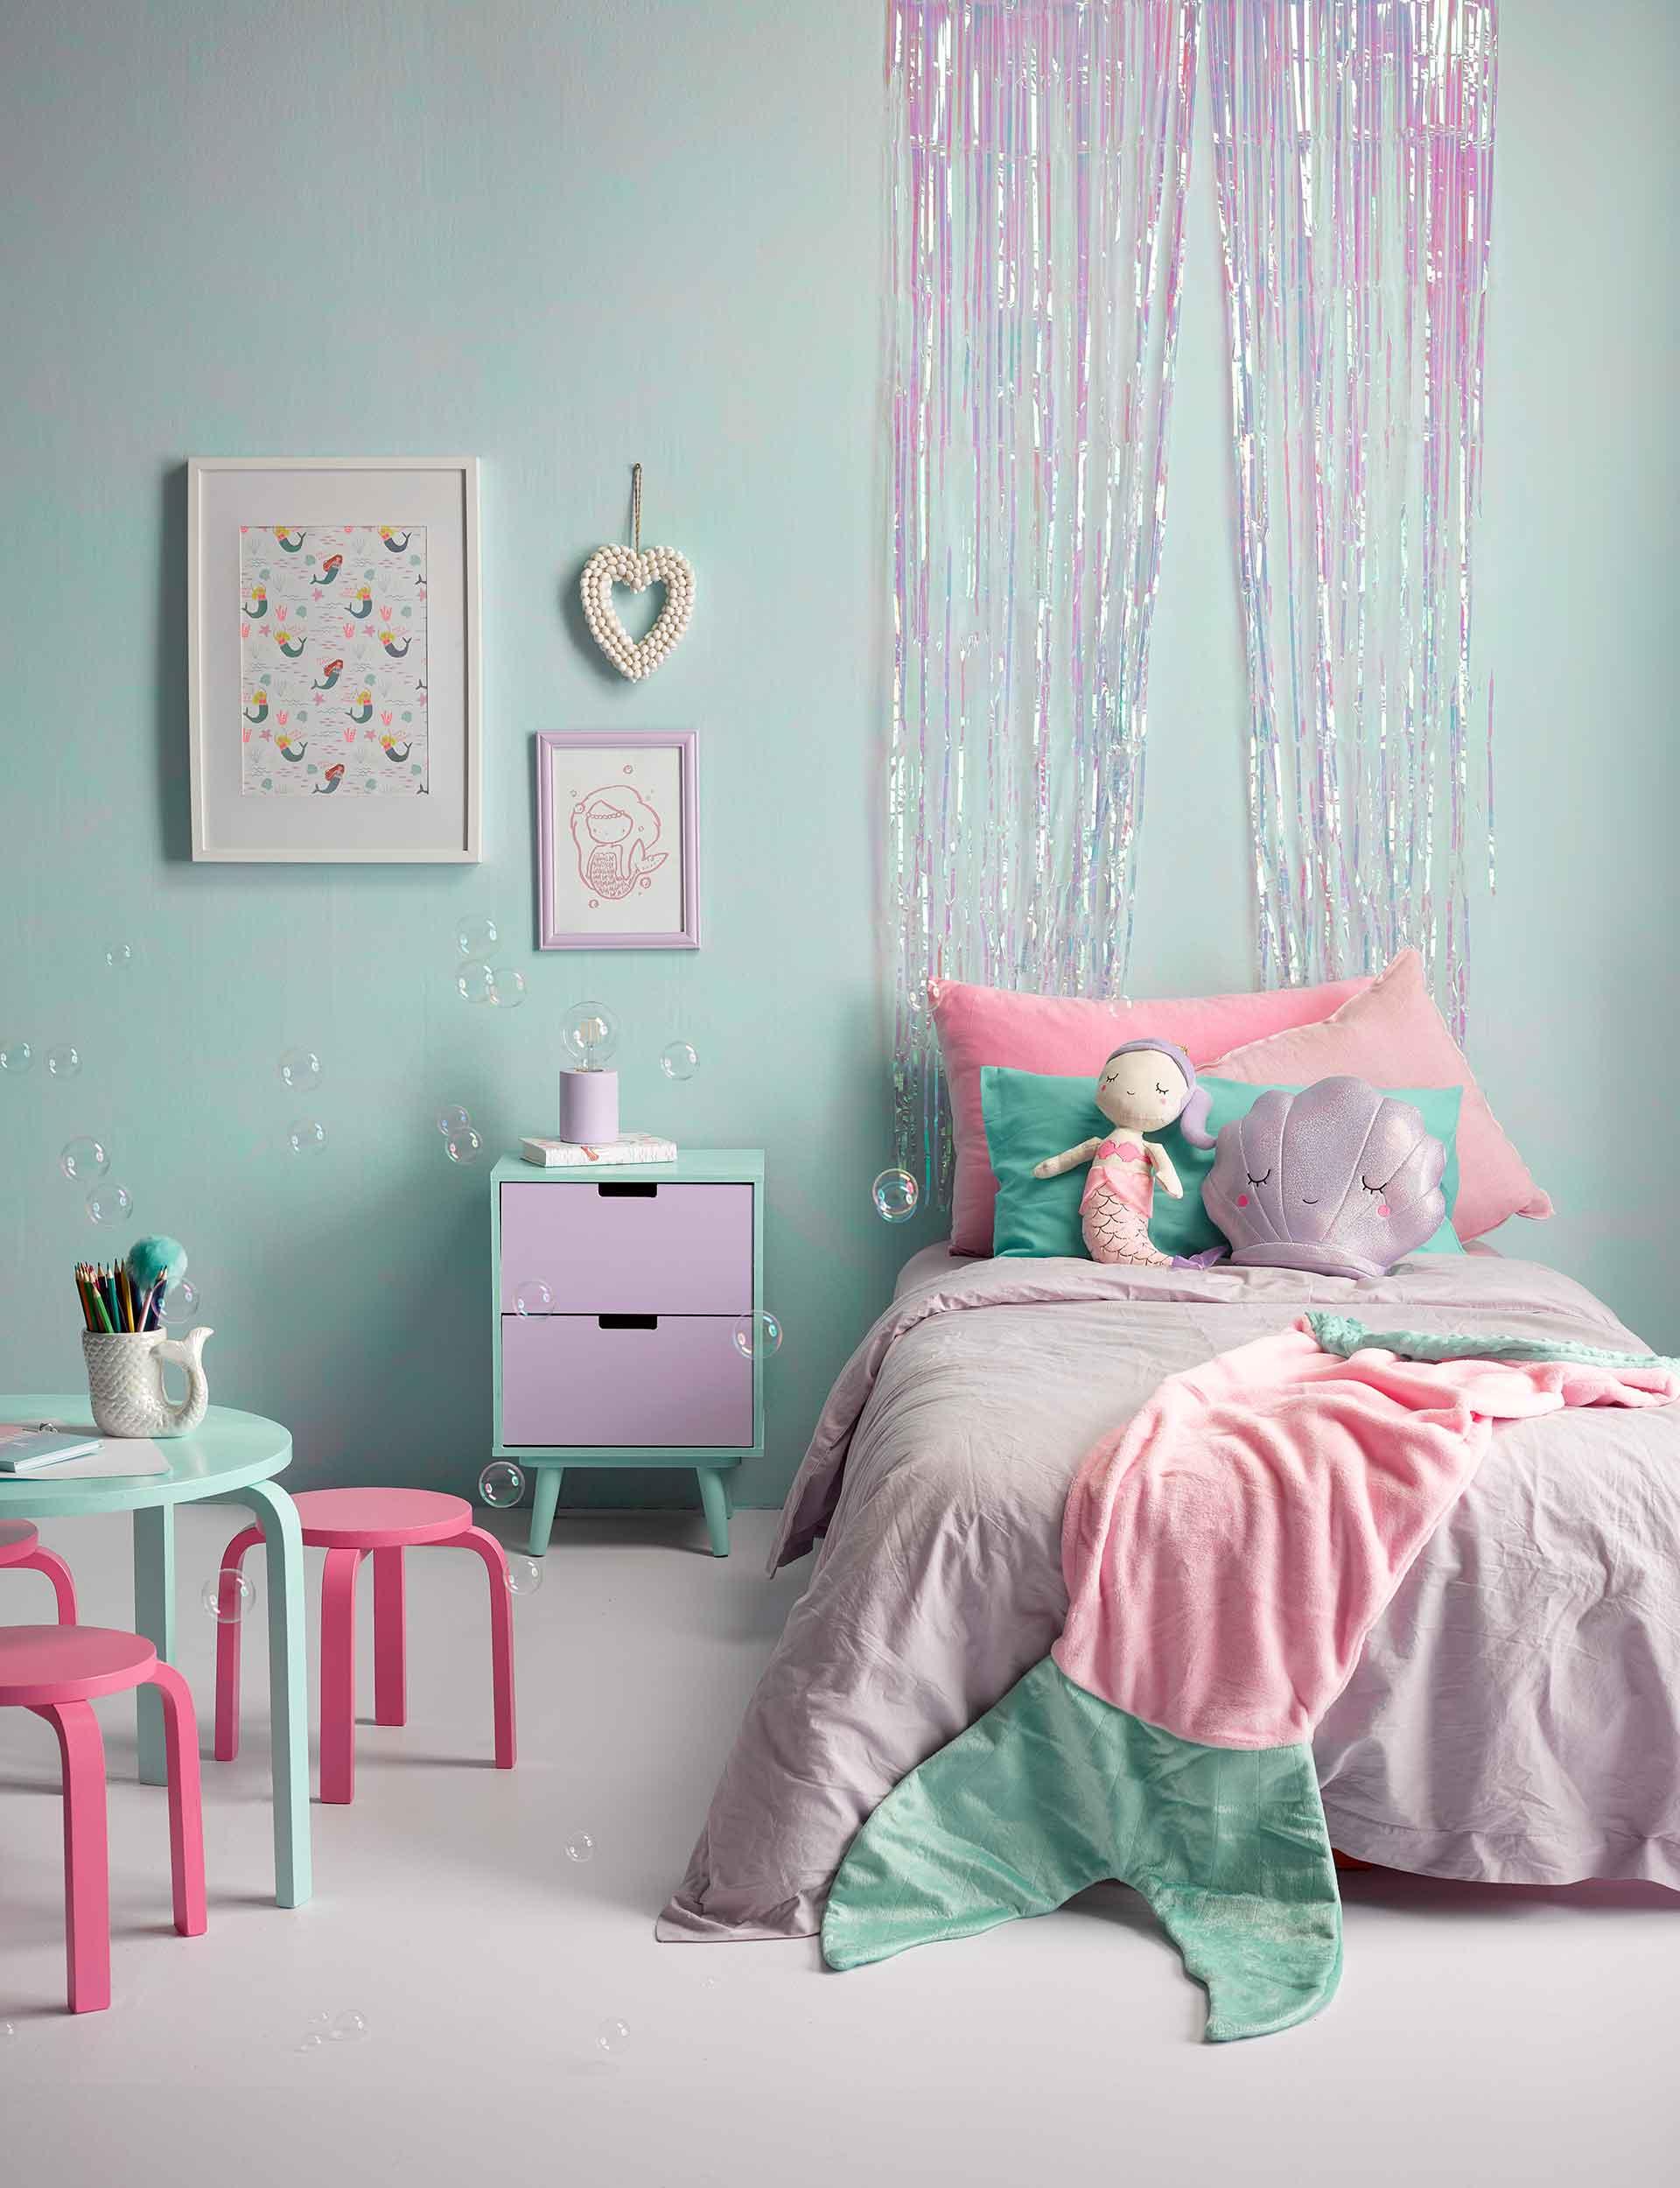 33 Whimsical Mermaid Bedroom Ideas For Girls Momooze